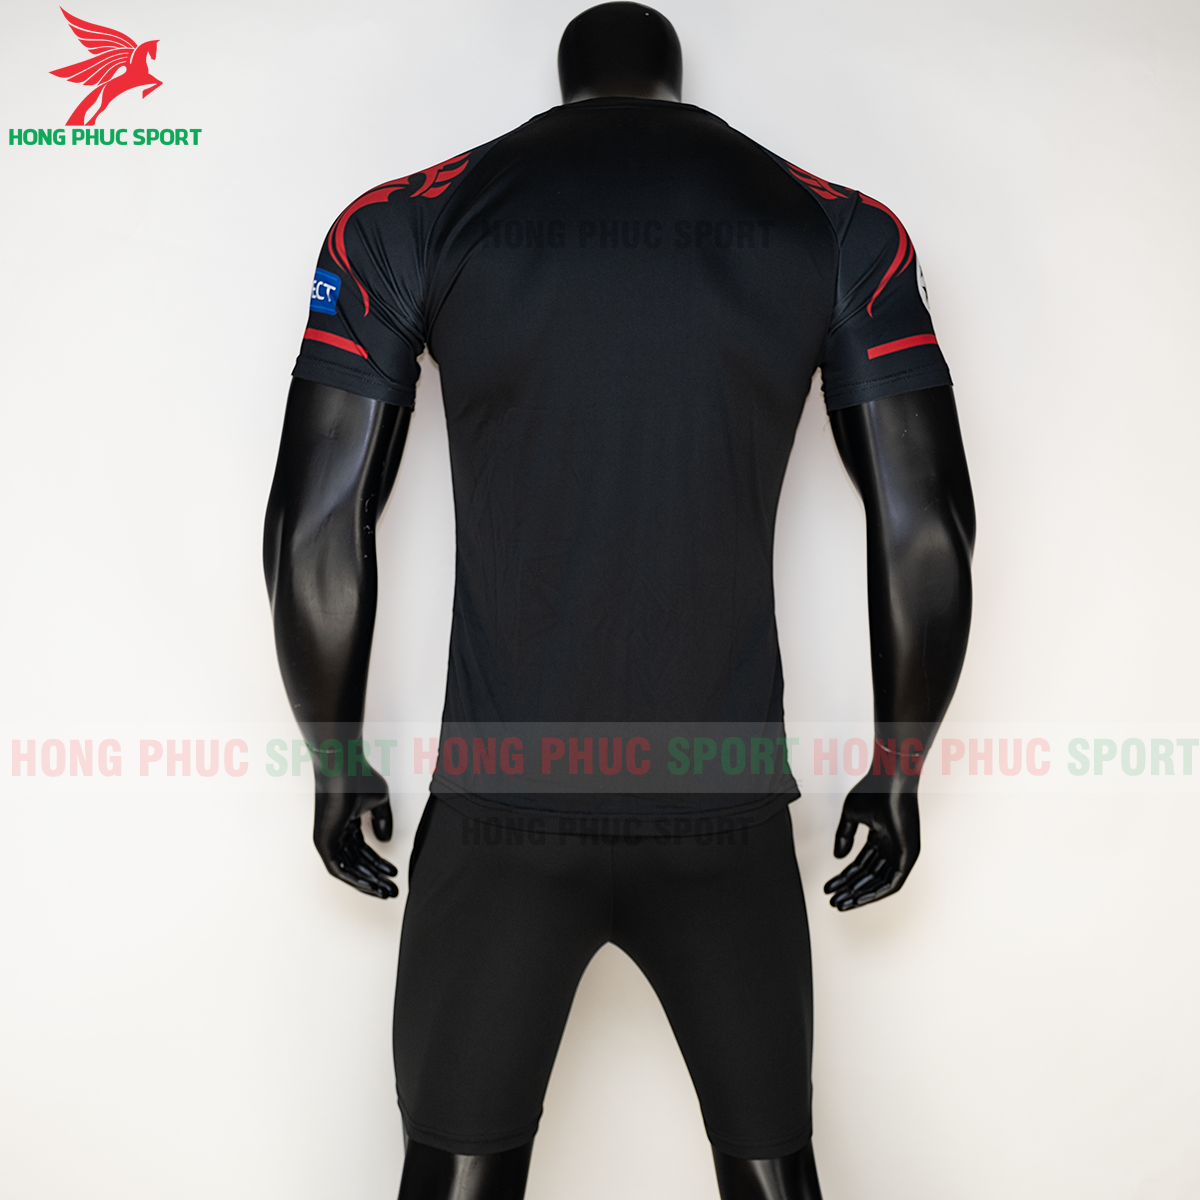 https://cdn.hongphucsport.com/unsafe/s4.shopbay.vn/files/285/ao-liverpool-2020-phien-ban-fan-7-5f72b8915b202.png